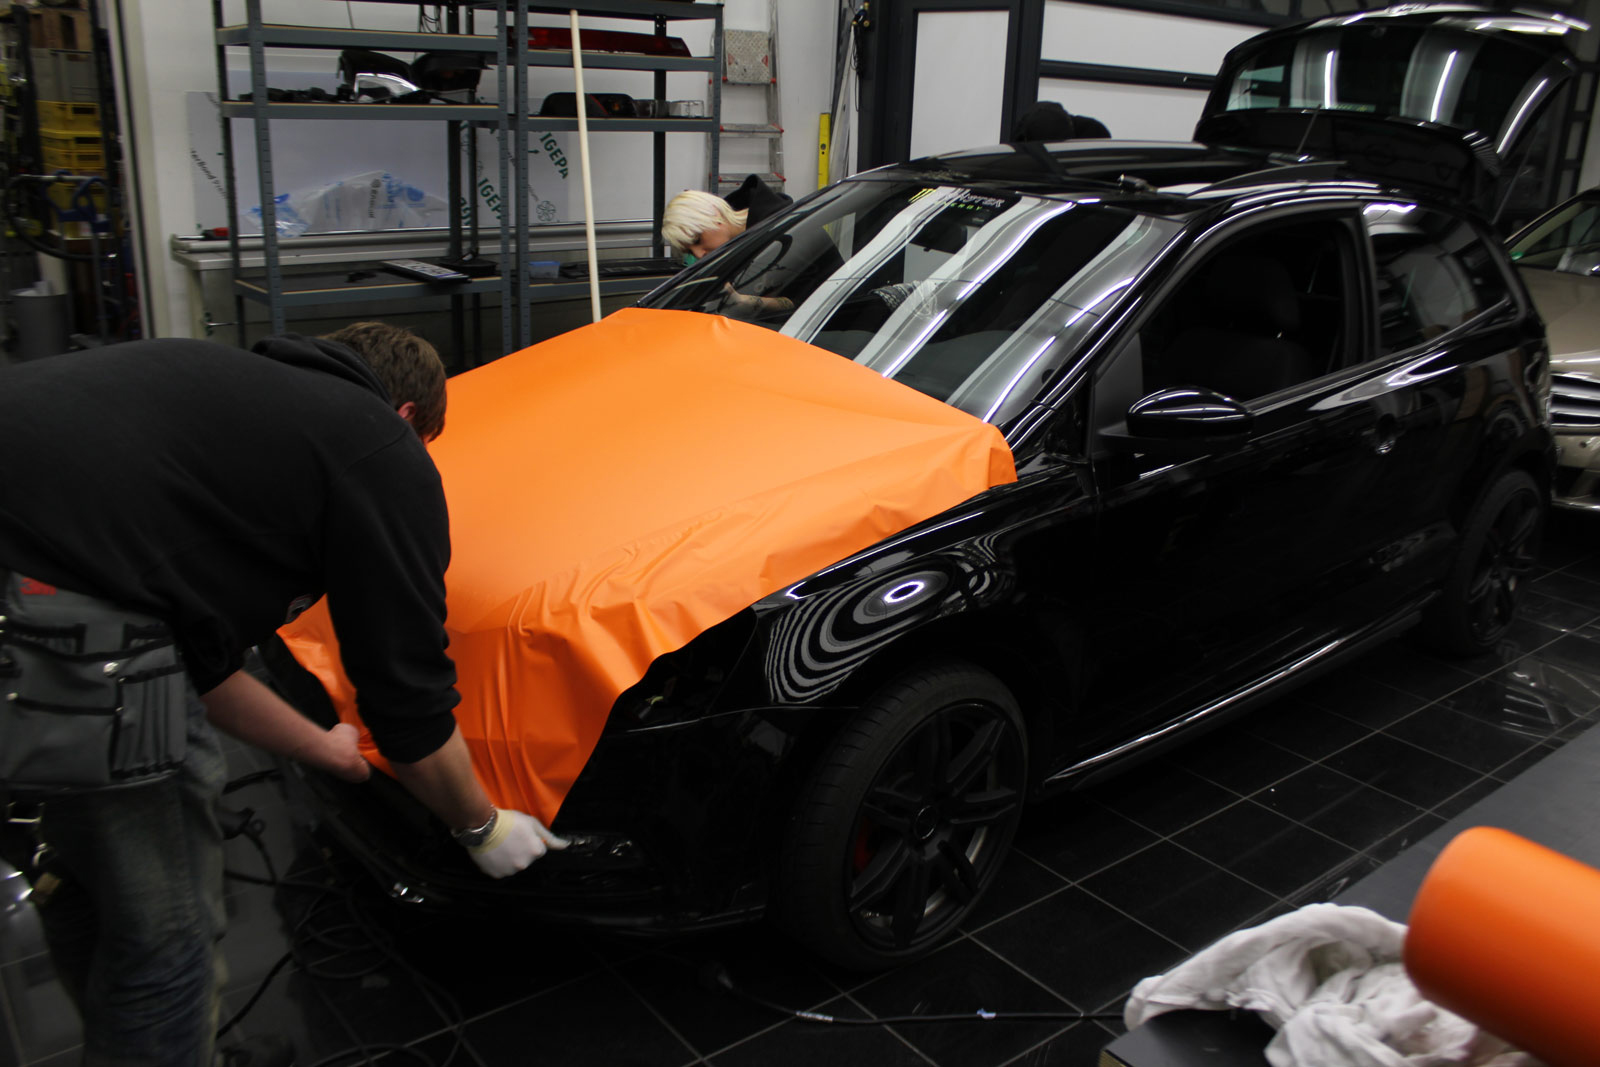 VW_Polo_GTI_Folierung_Orange_Matt_07